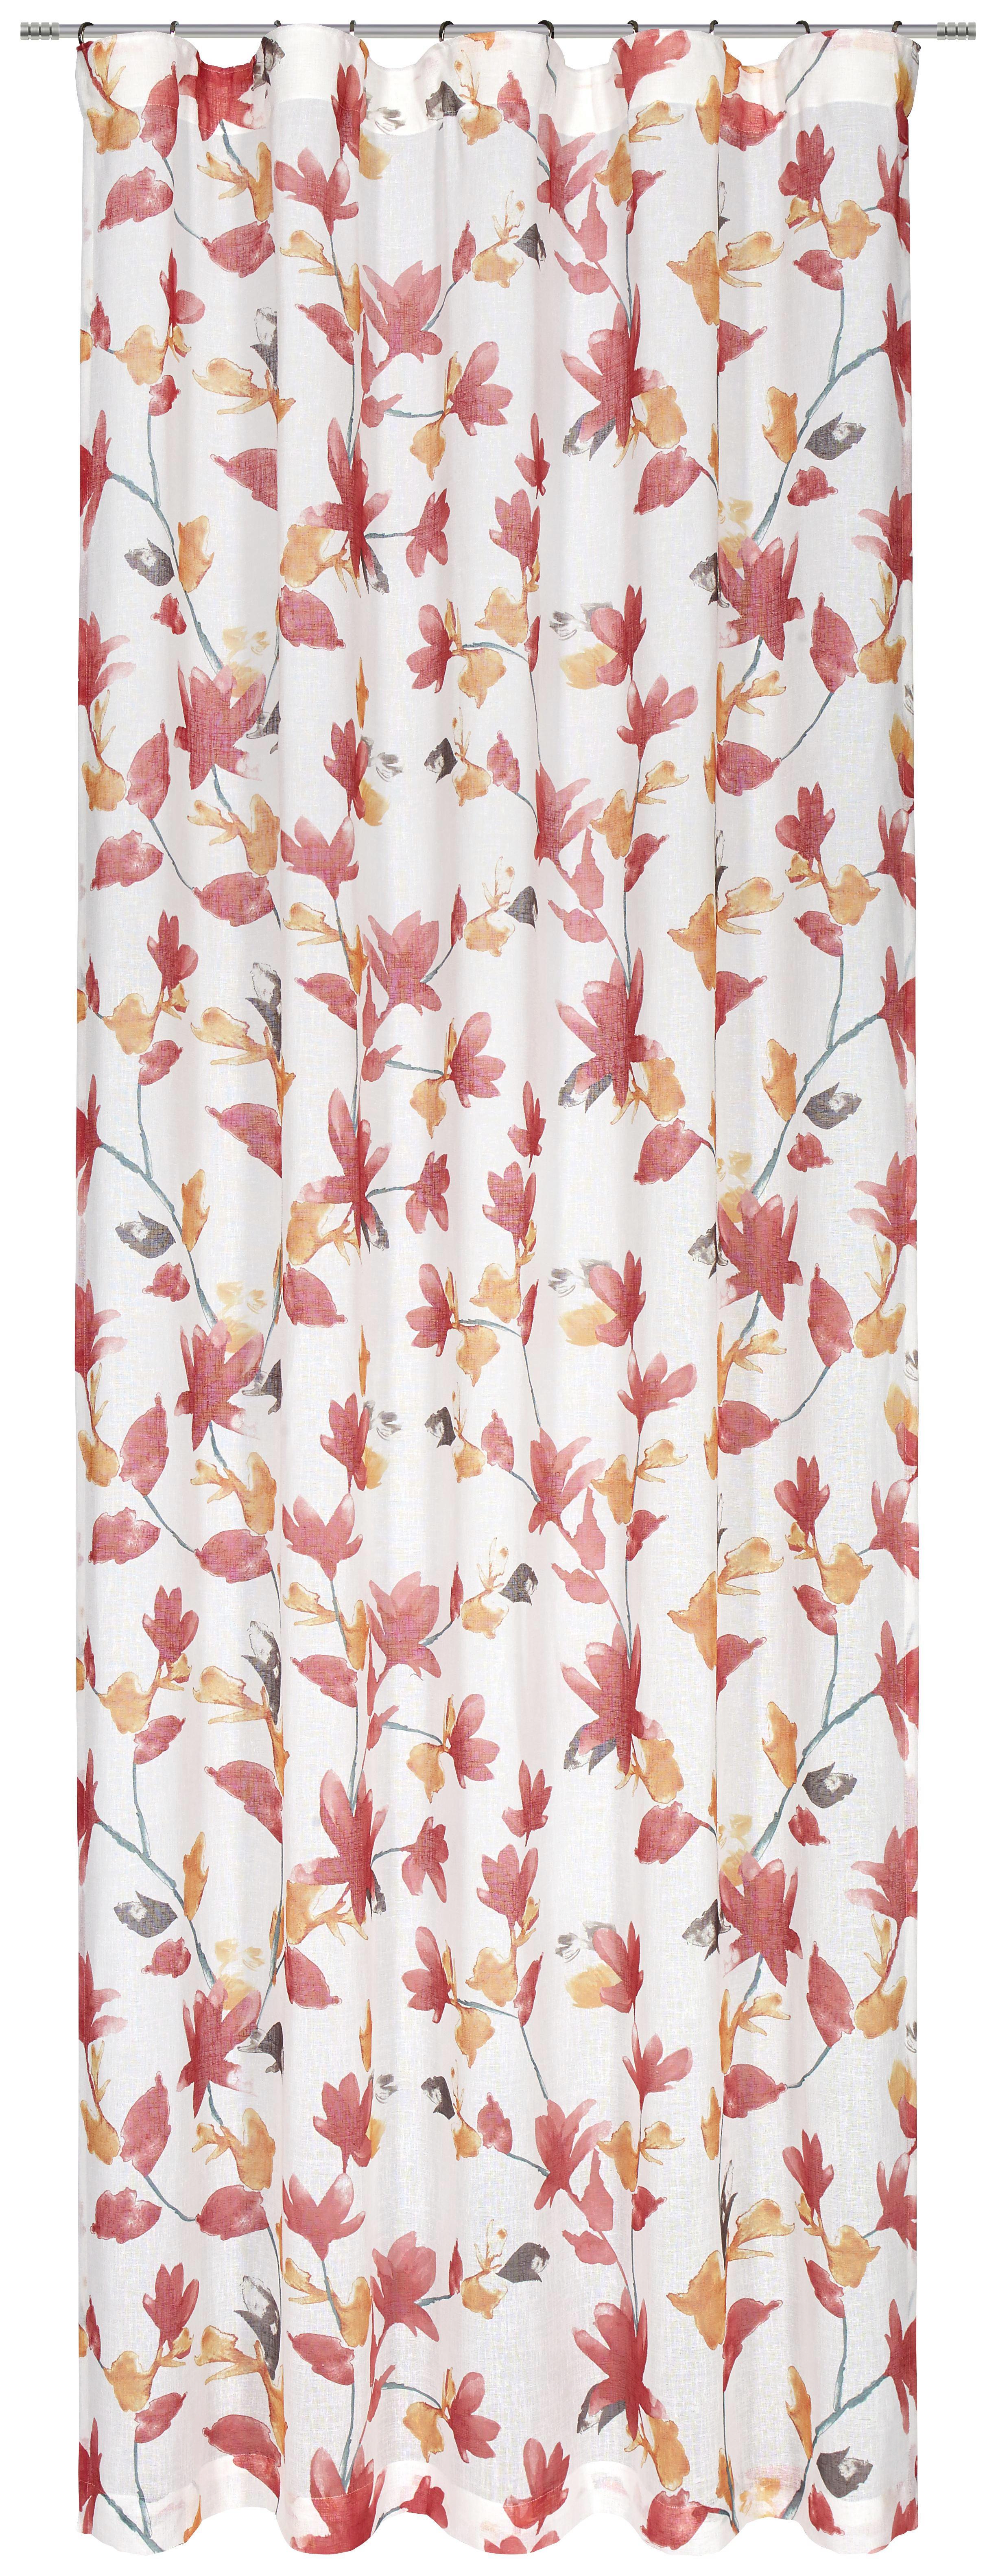 FERTIGVORHANG halbtransparent - Rot/Orange, MODERN, Textil (135/245cm) - ESPOSA